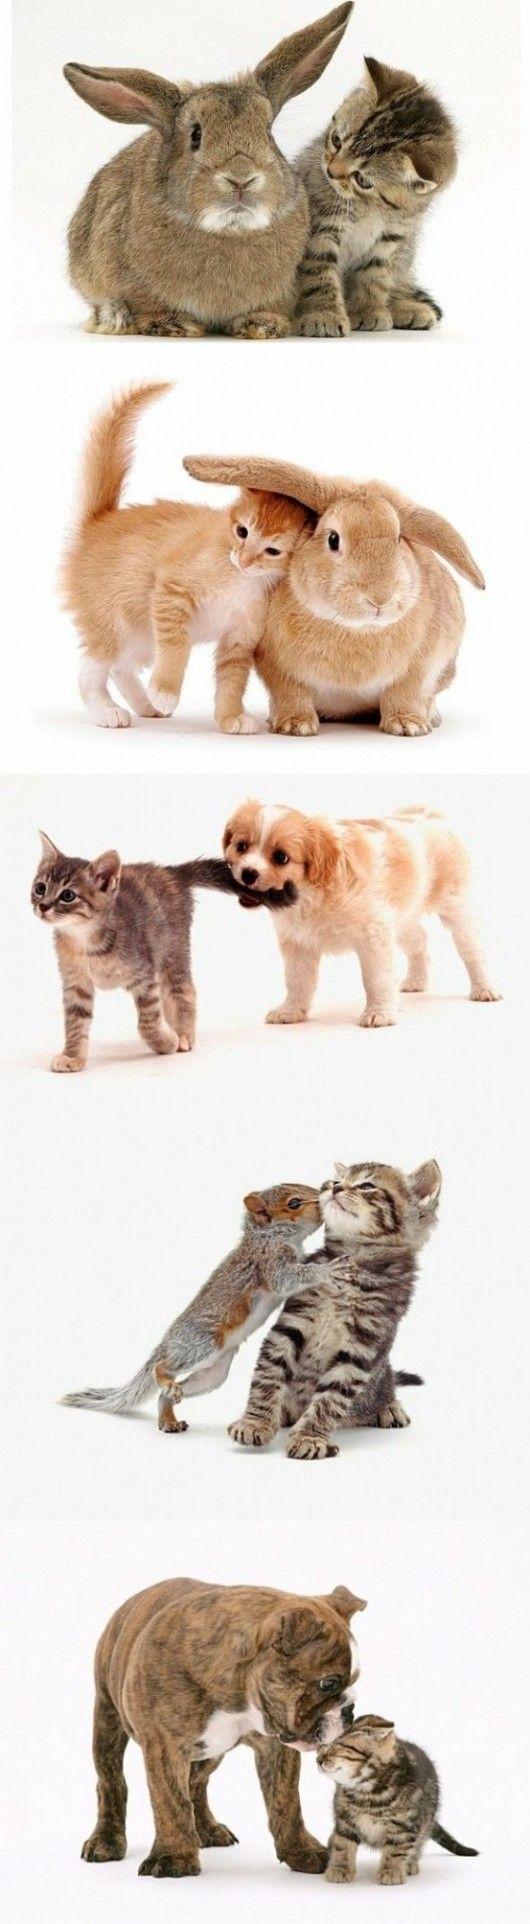 little animal love!